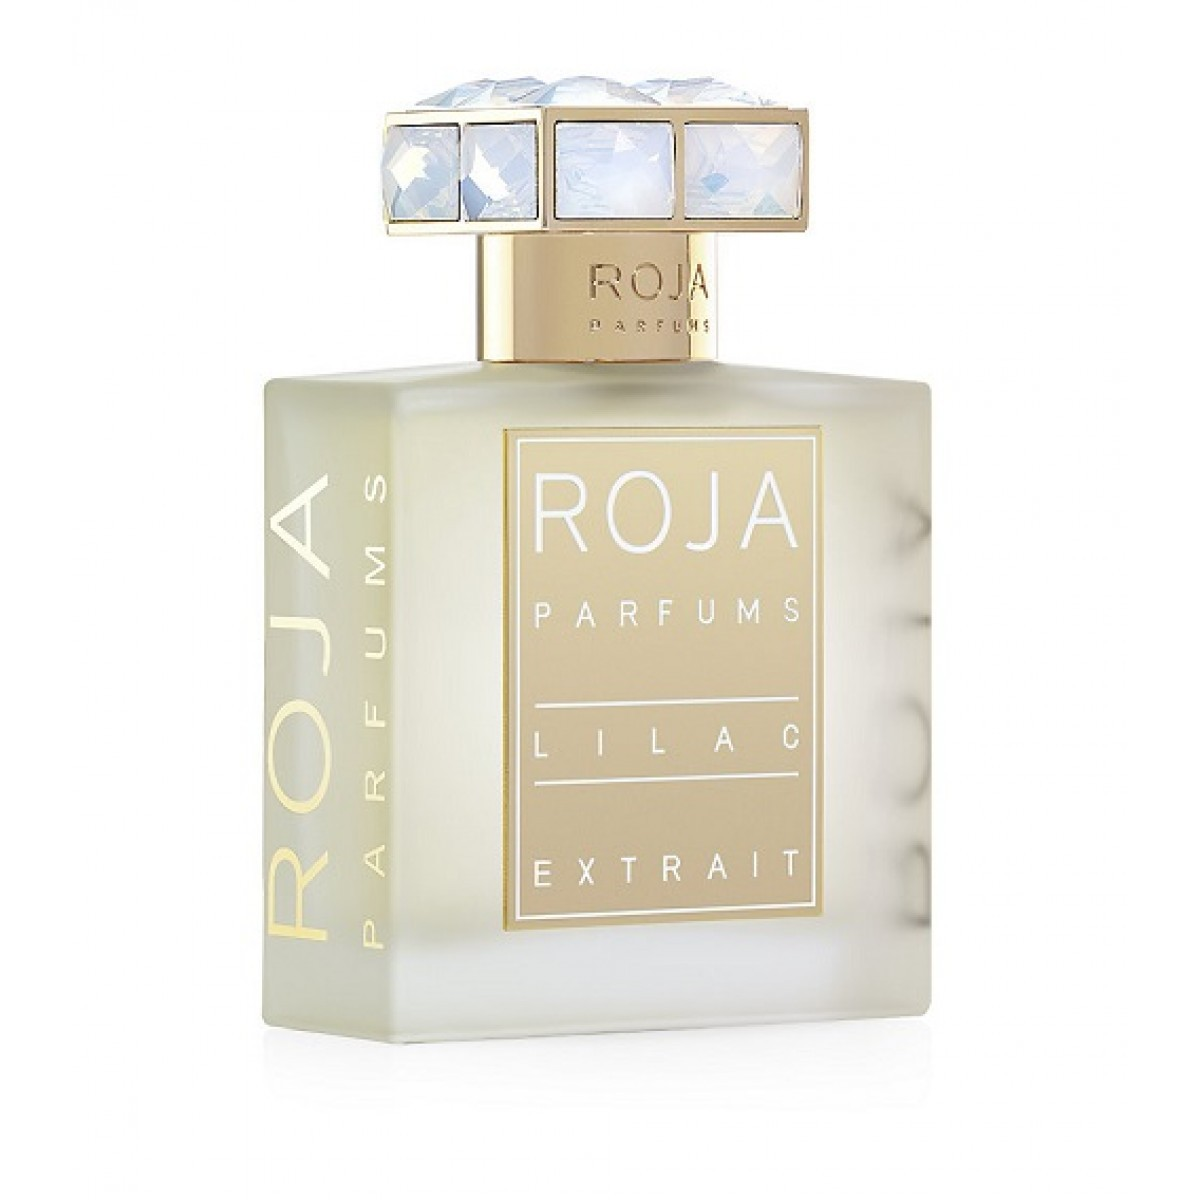 LILAC EXTRAIT by ROJA Perfume 5ml Travel Spray BERGAMOTE HELIOTROPE VAULTED